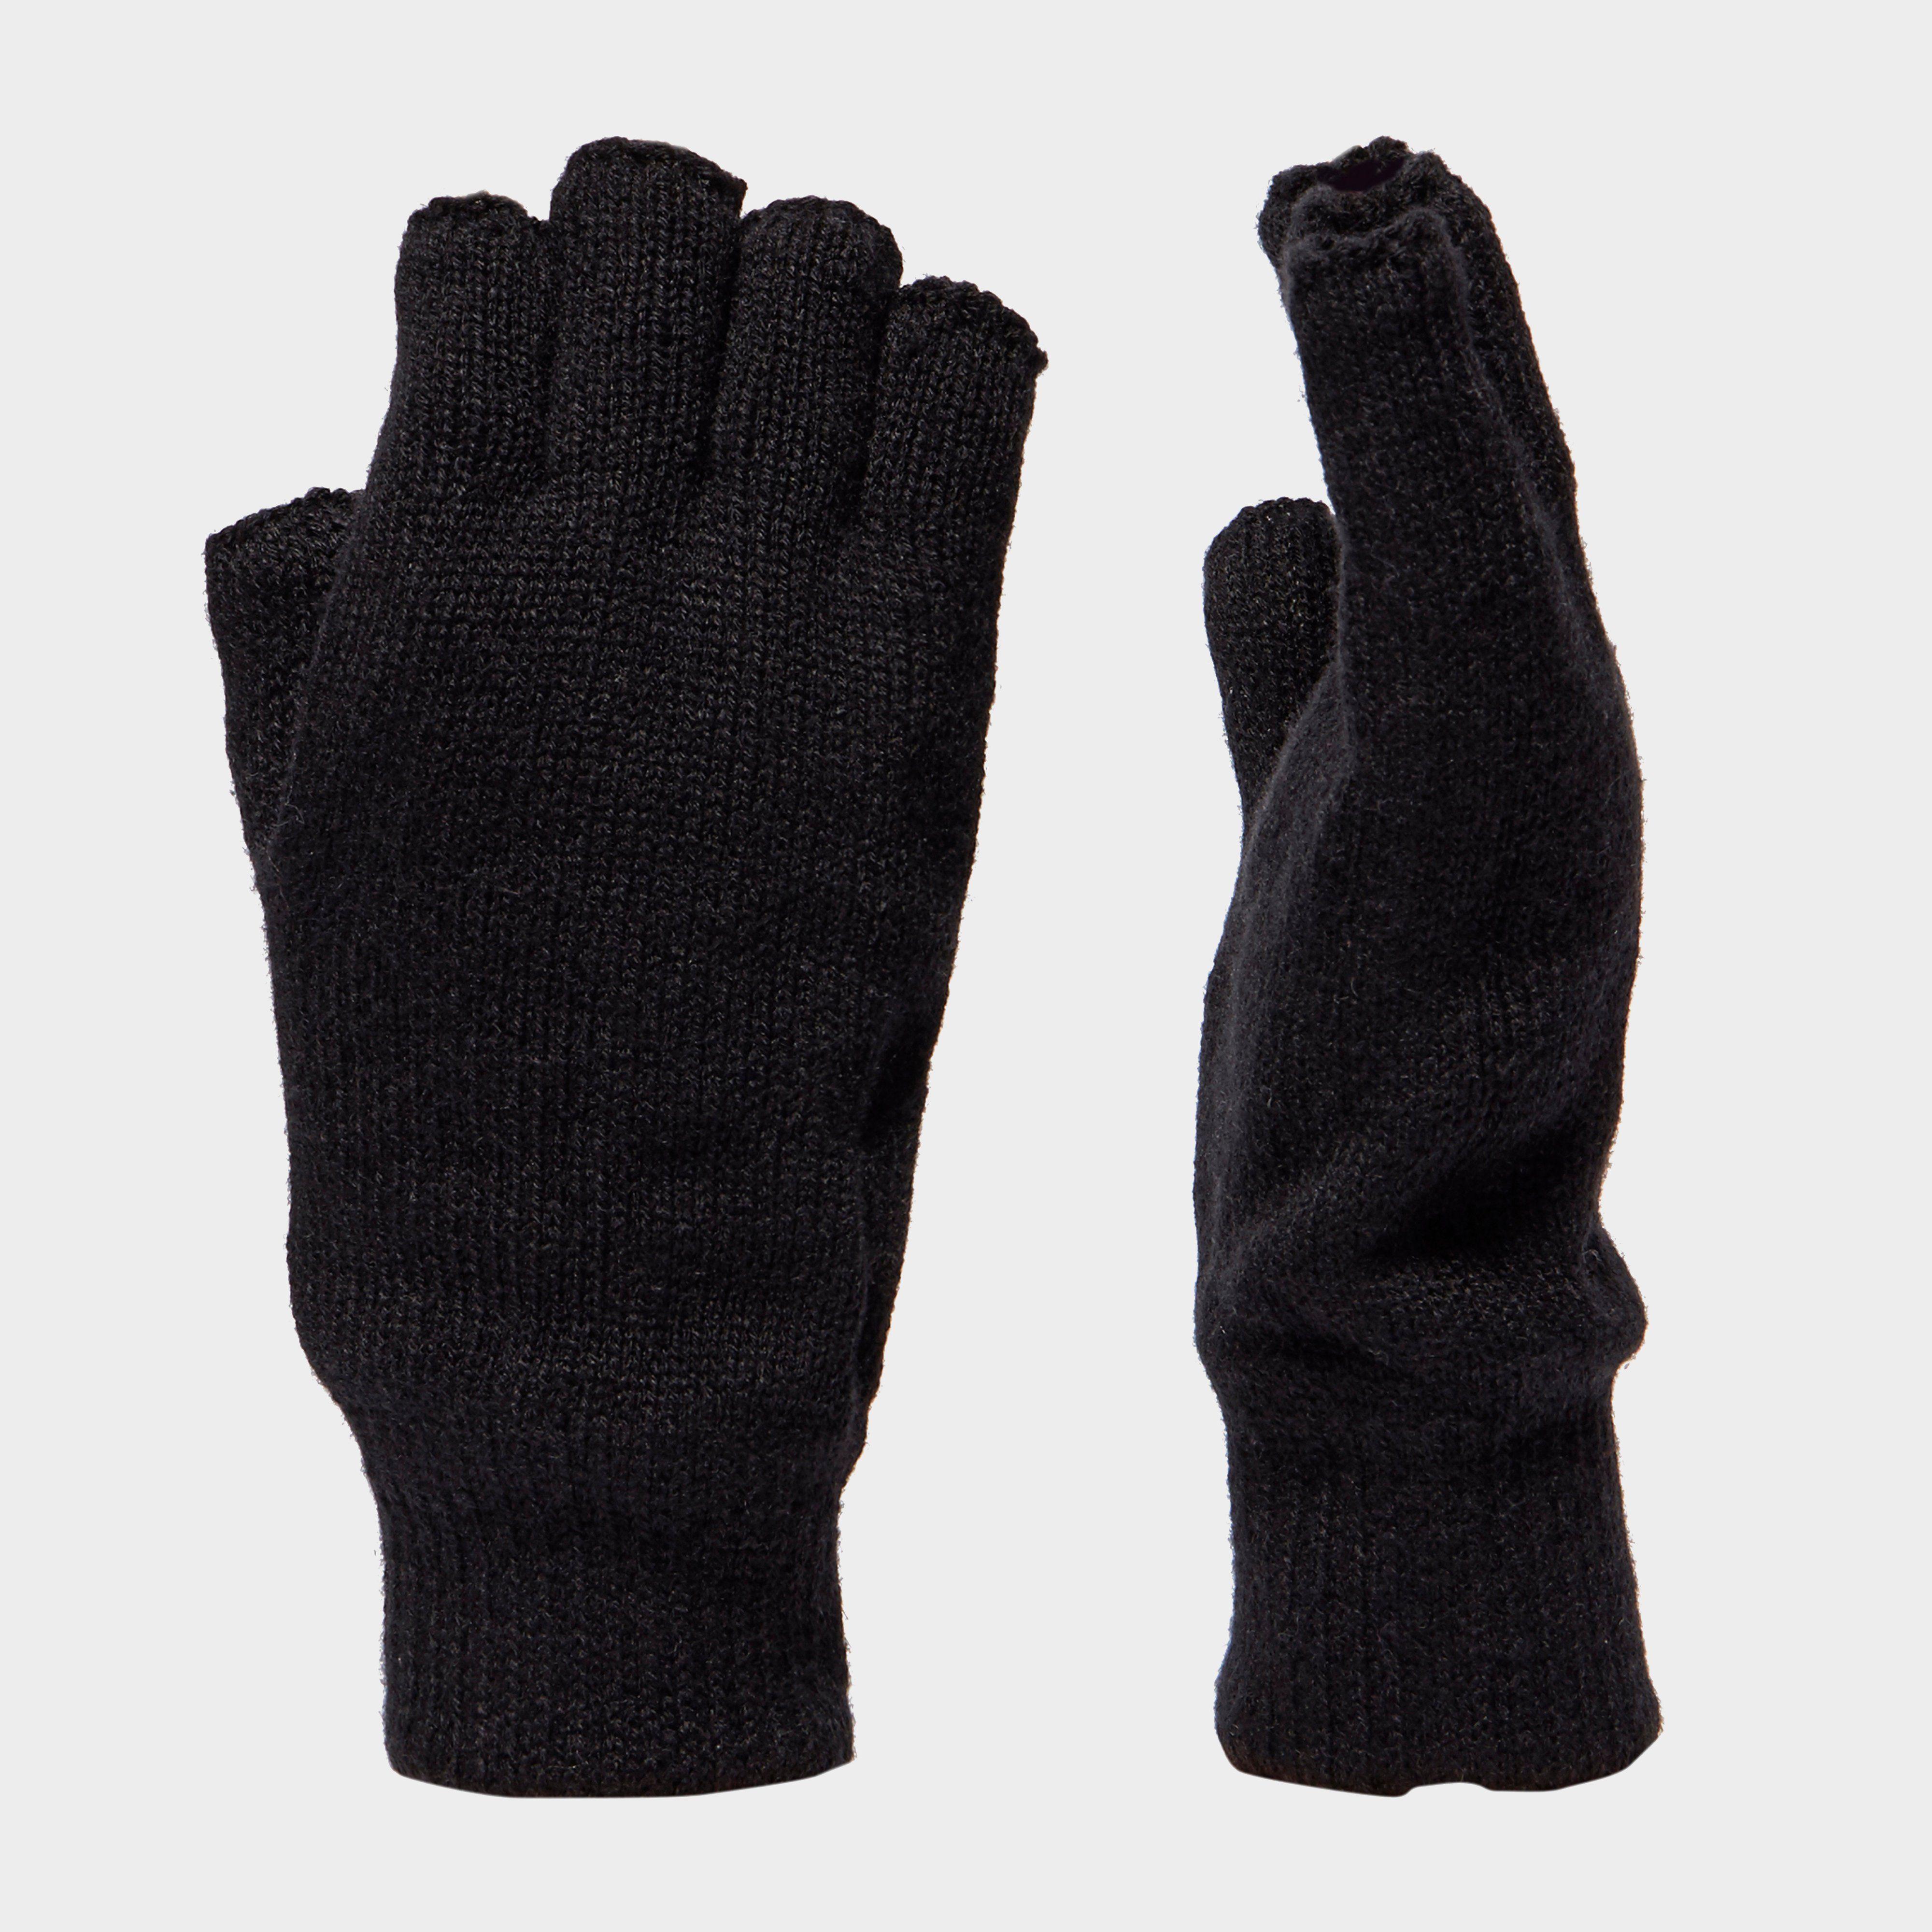 PETER STORM Thinsulate Fingerless Gloves